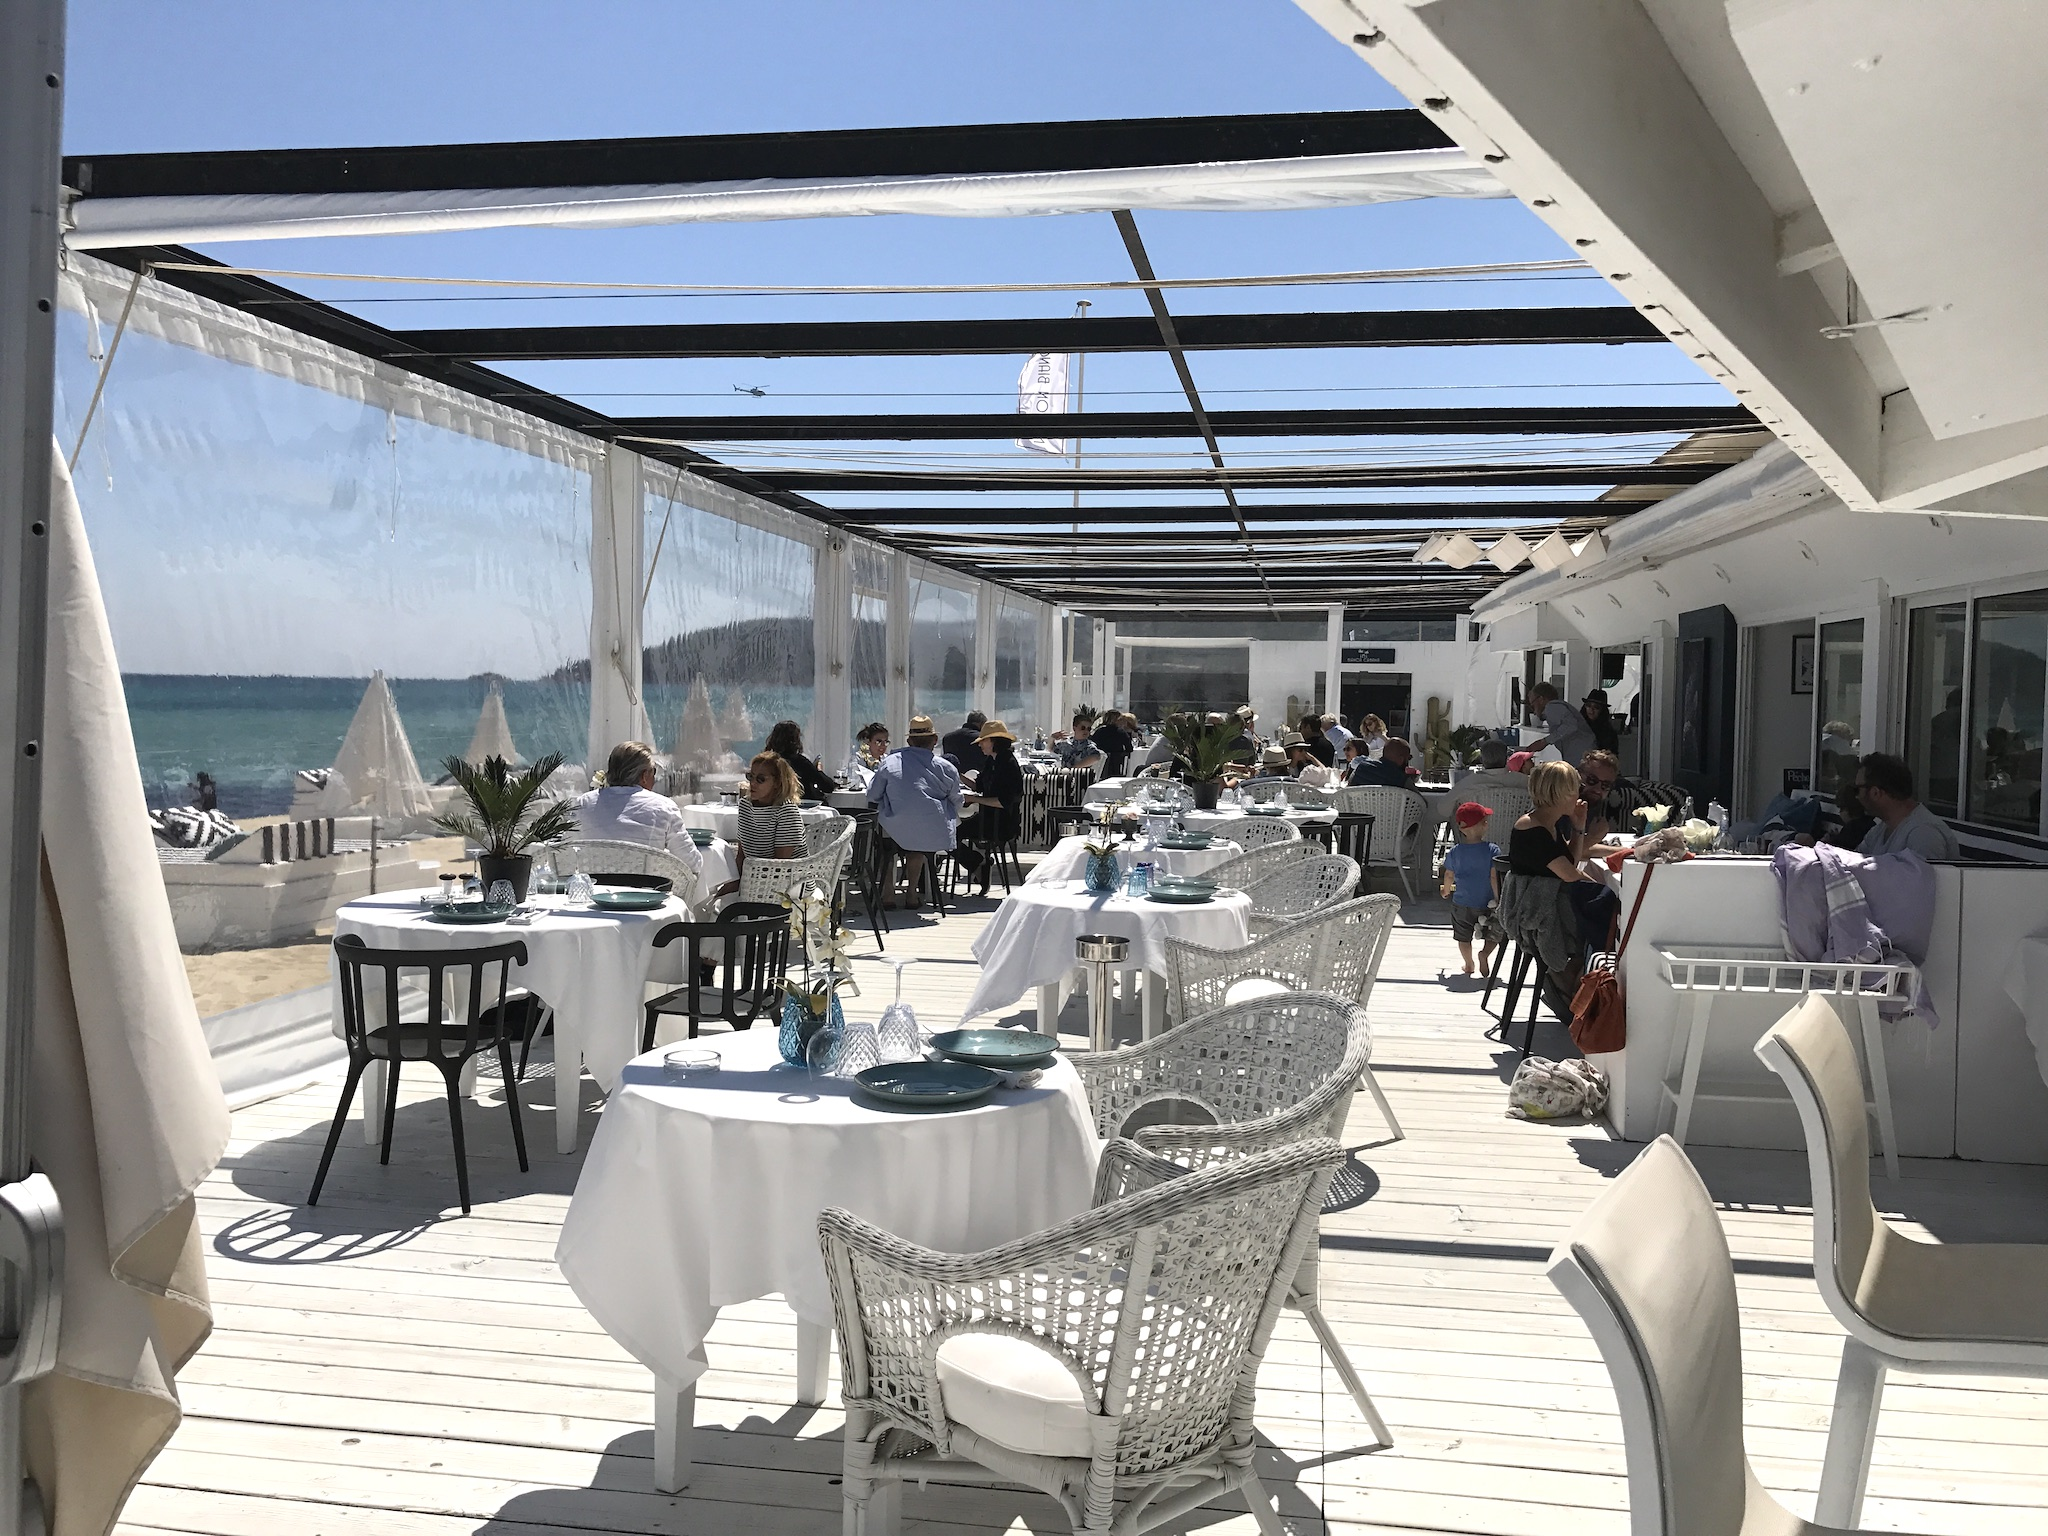 Maison Bianca Pampelonne Plage, Maison Bianca Beach Club St. Tropez, best beach club St. Tropez, super Strand Club Cote d´Azur, St. Tropez Beach Club, Lifestyle-Blog, Lieblingstil.com